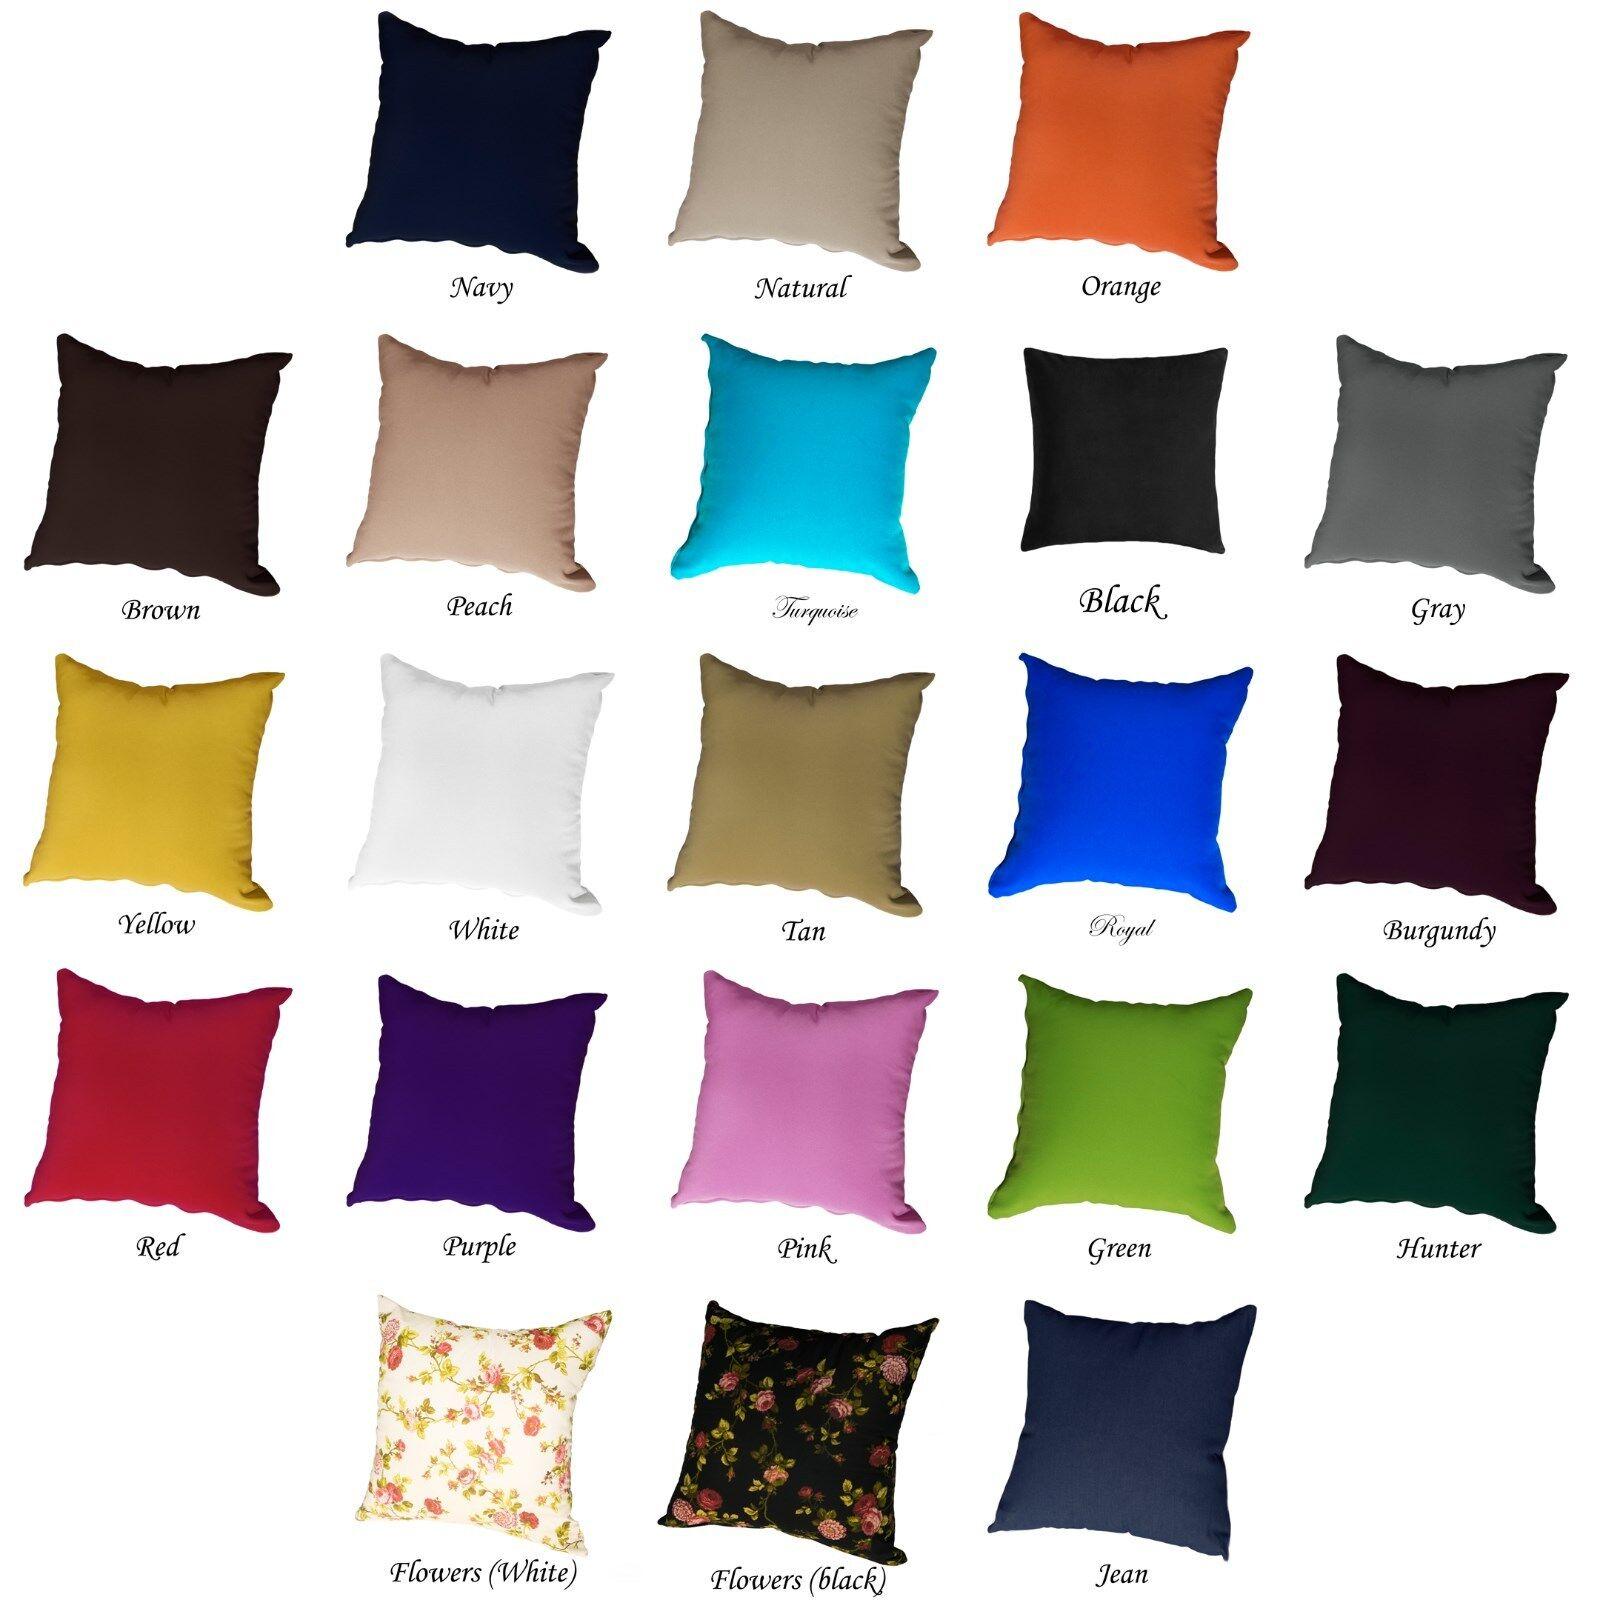 Fashion Cushion Cover Pillow Case Home Sofa Decor size 12 18